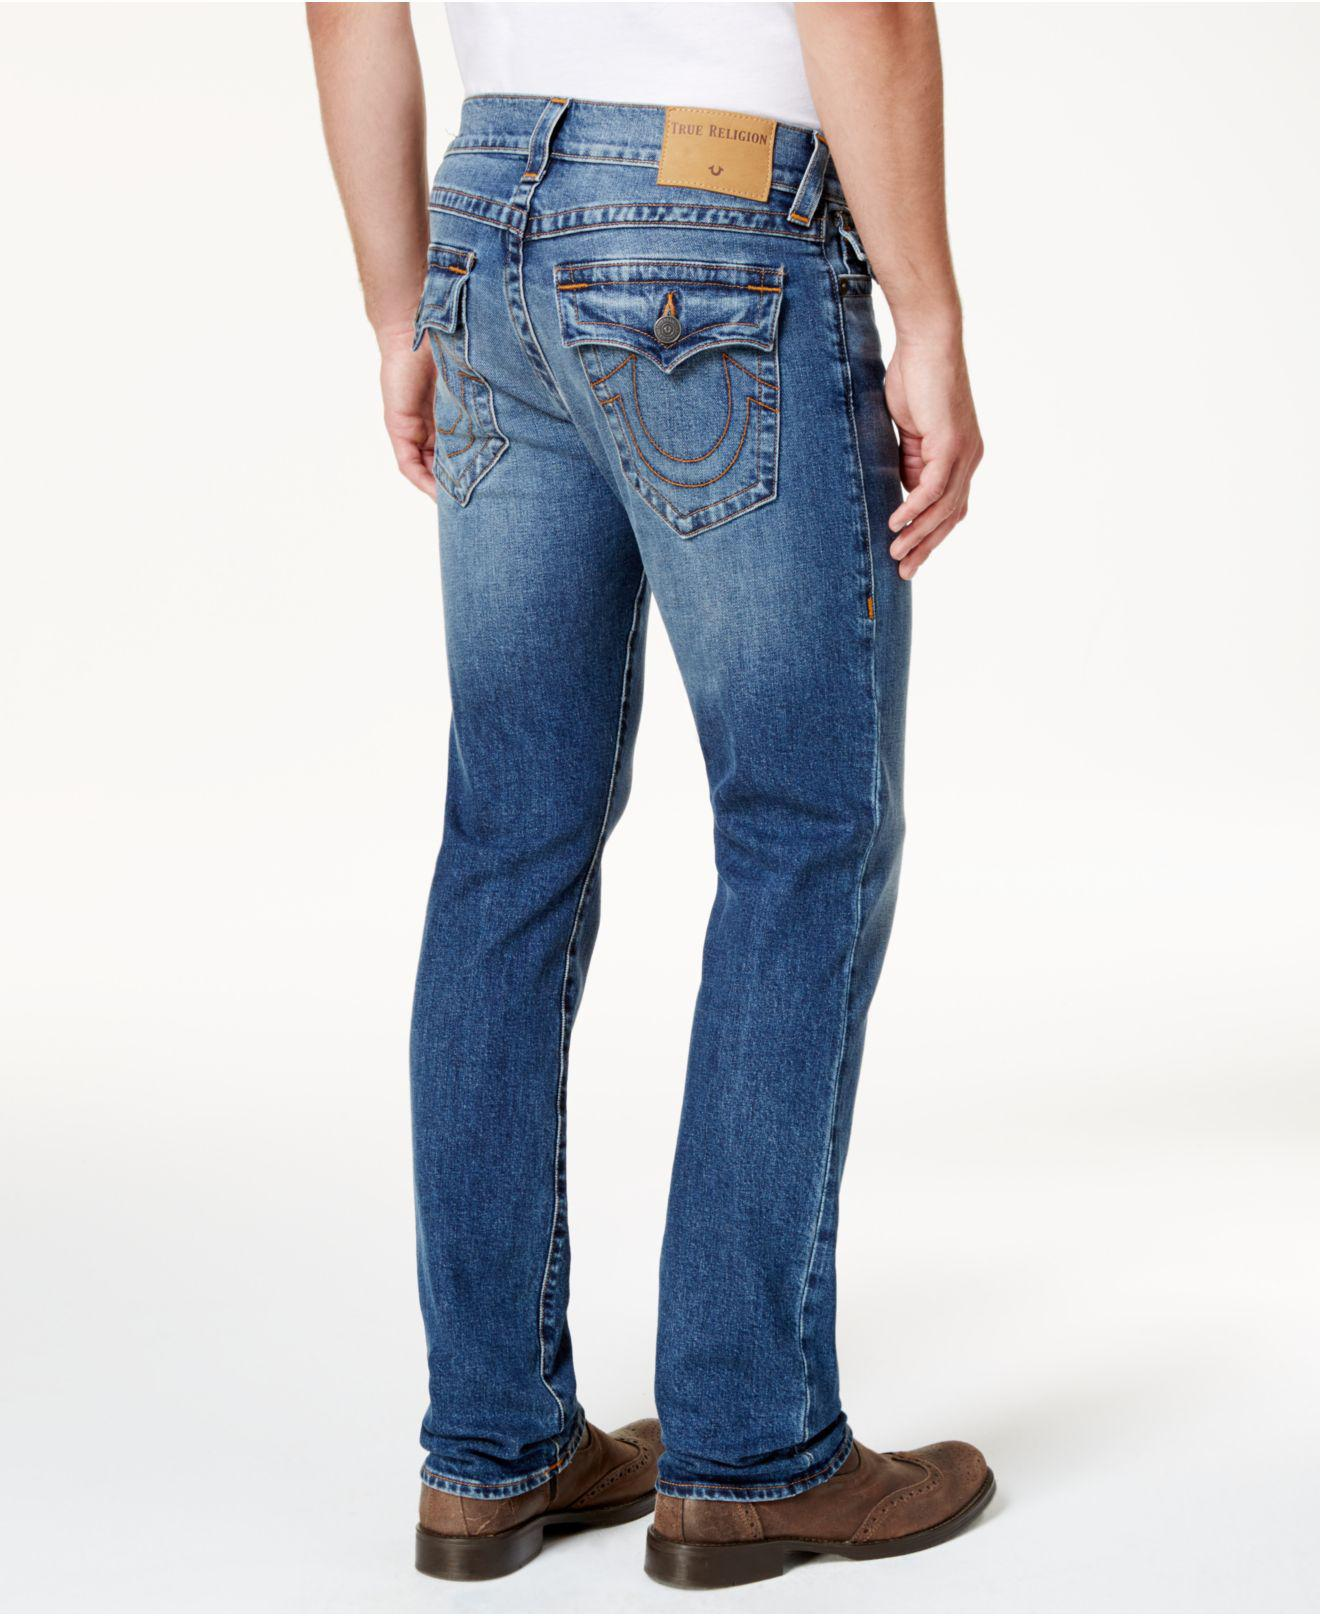 10bf37990 Lyst - True Religion Men s Indigo Jeans in Blue for Men